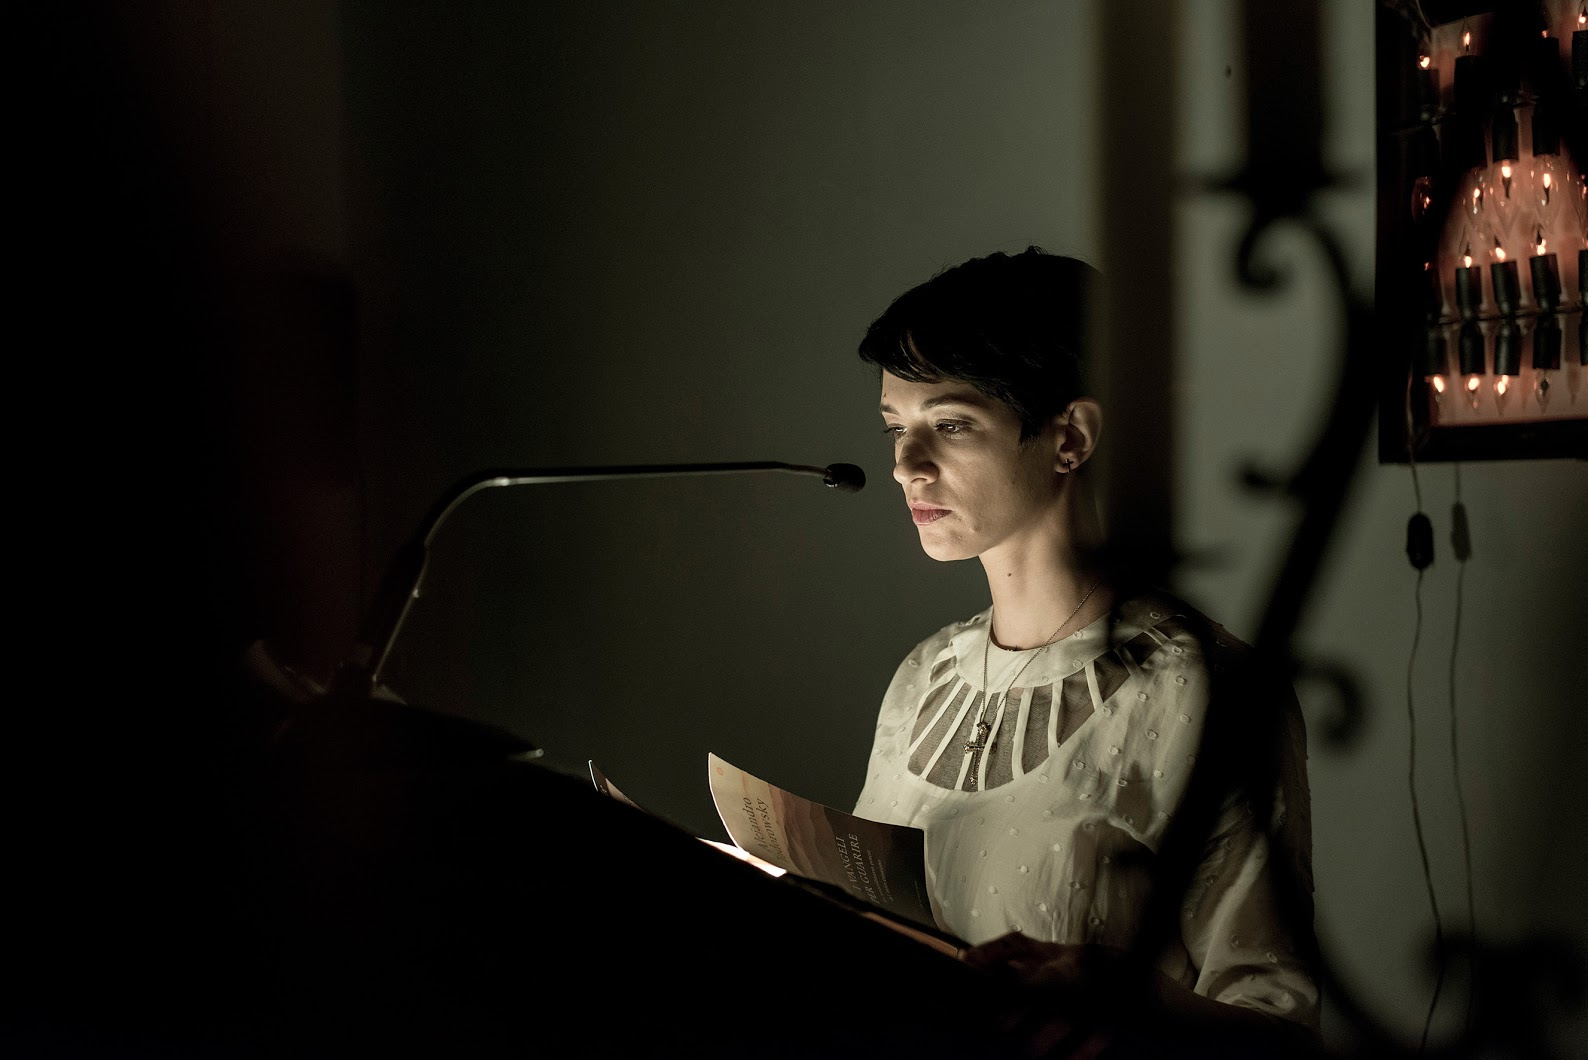 Ludovica Amati Trabalho de Concentracao presentation  fw15 ph.andreabuccella 18 Asia Argento